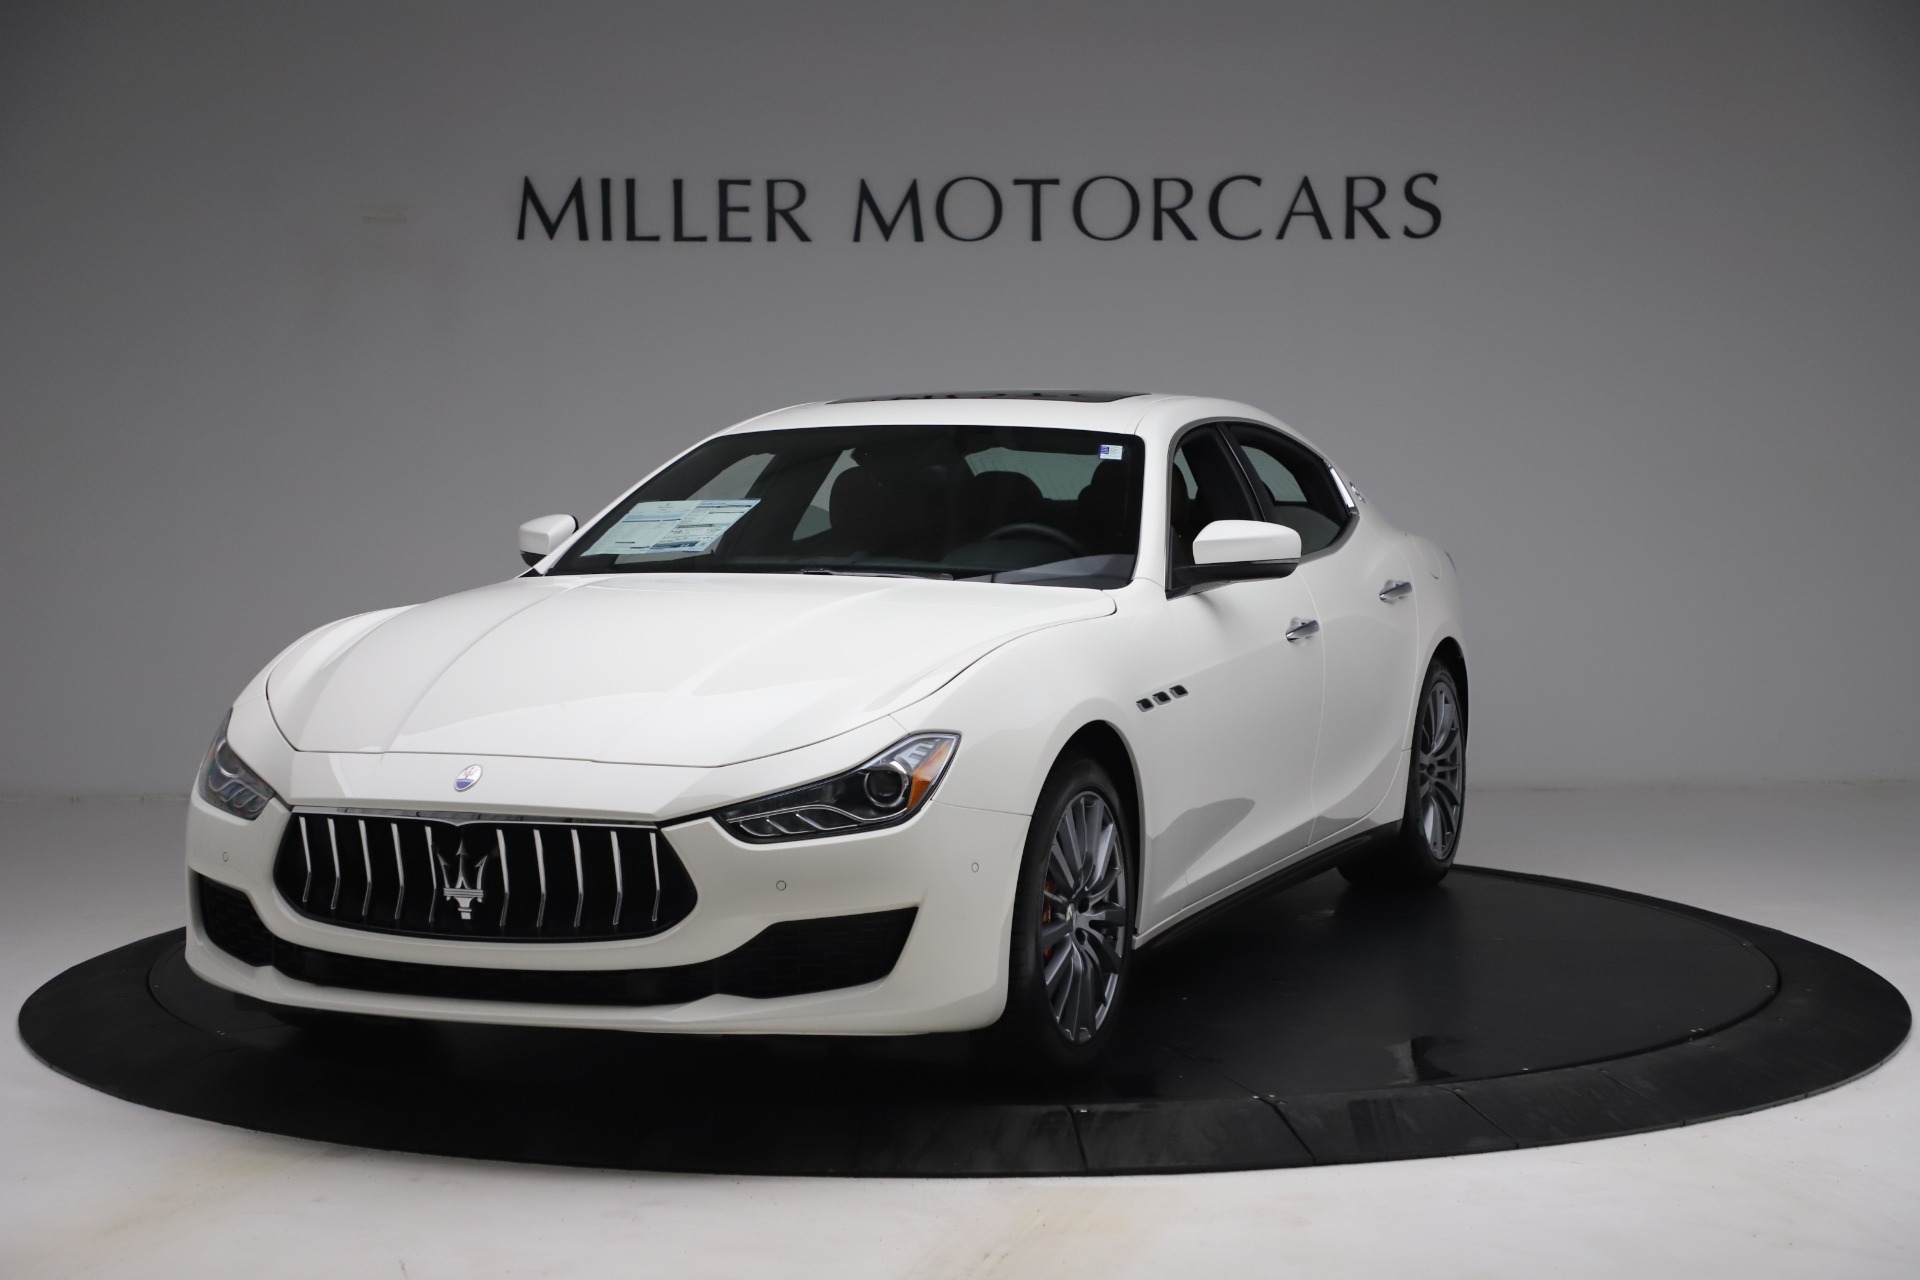 New 2021 Maserati Ghibli SQ4 for sale $85,804 at Rolls-Royce Motor Cars Greenwich in Greenwich CT 06830 1